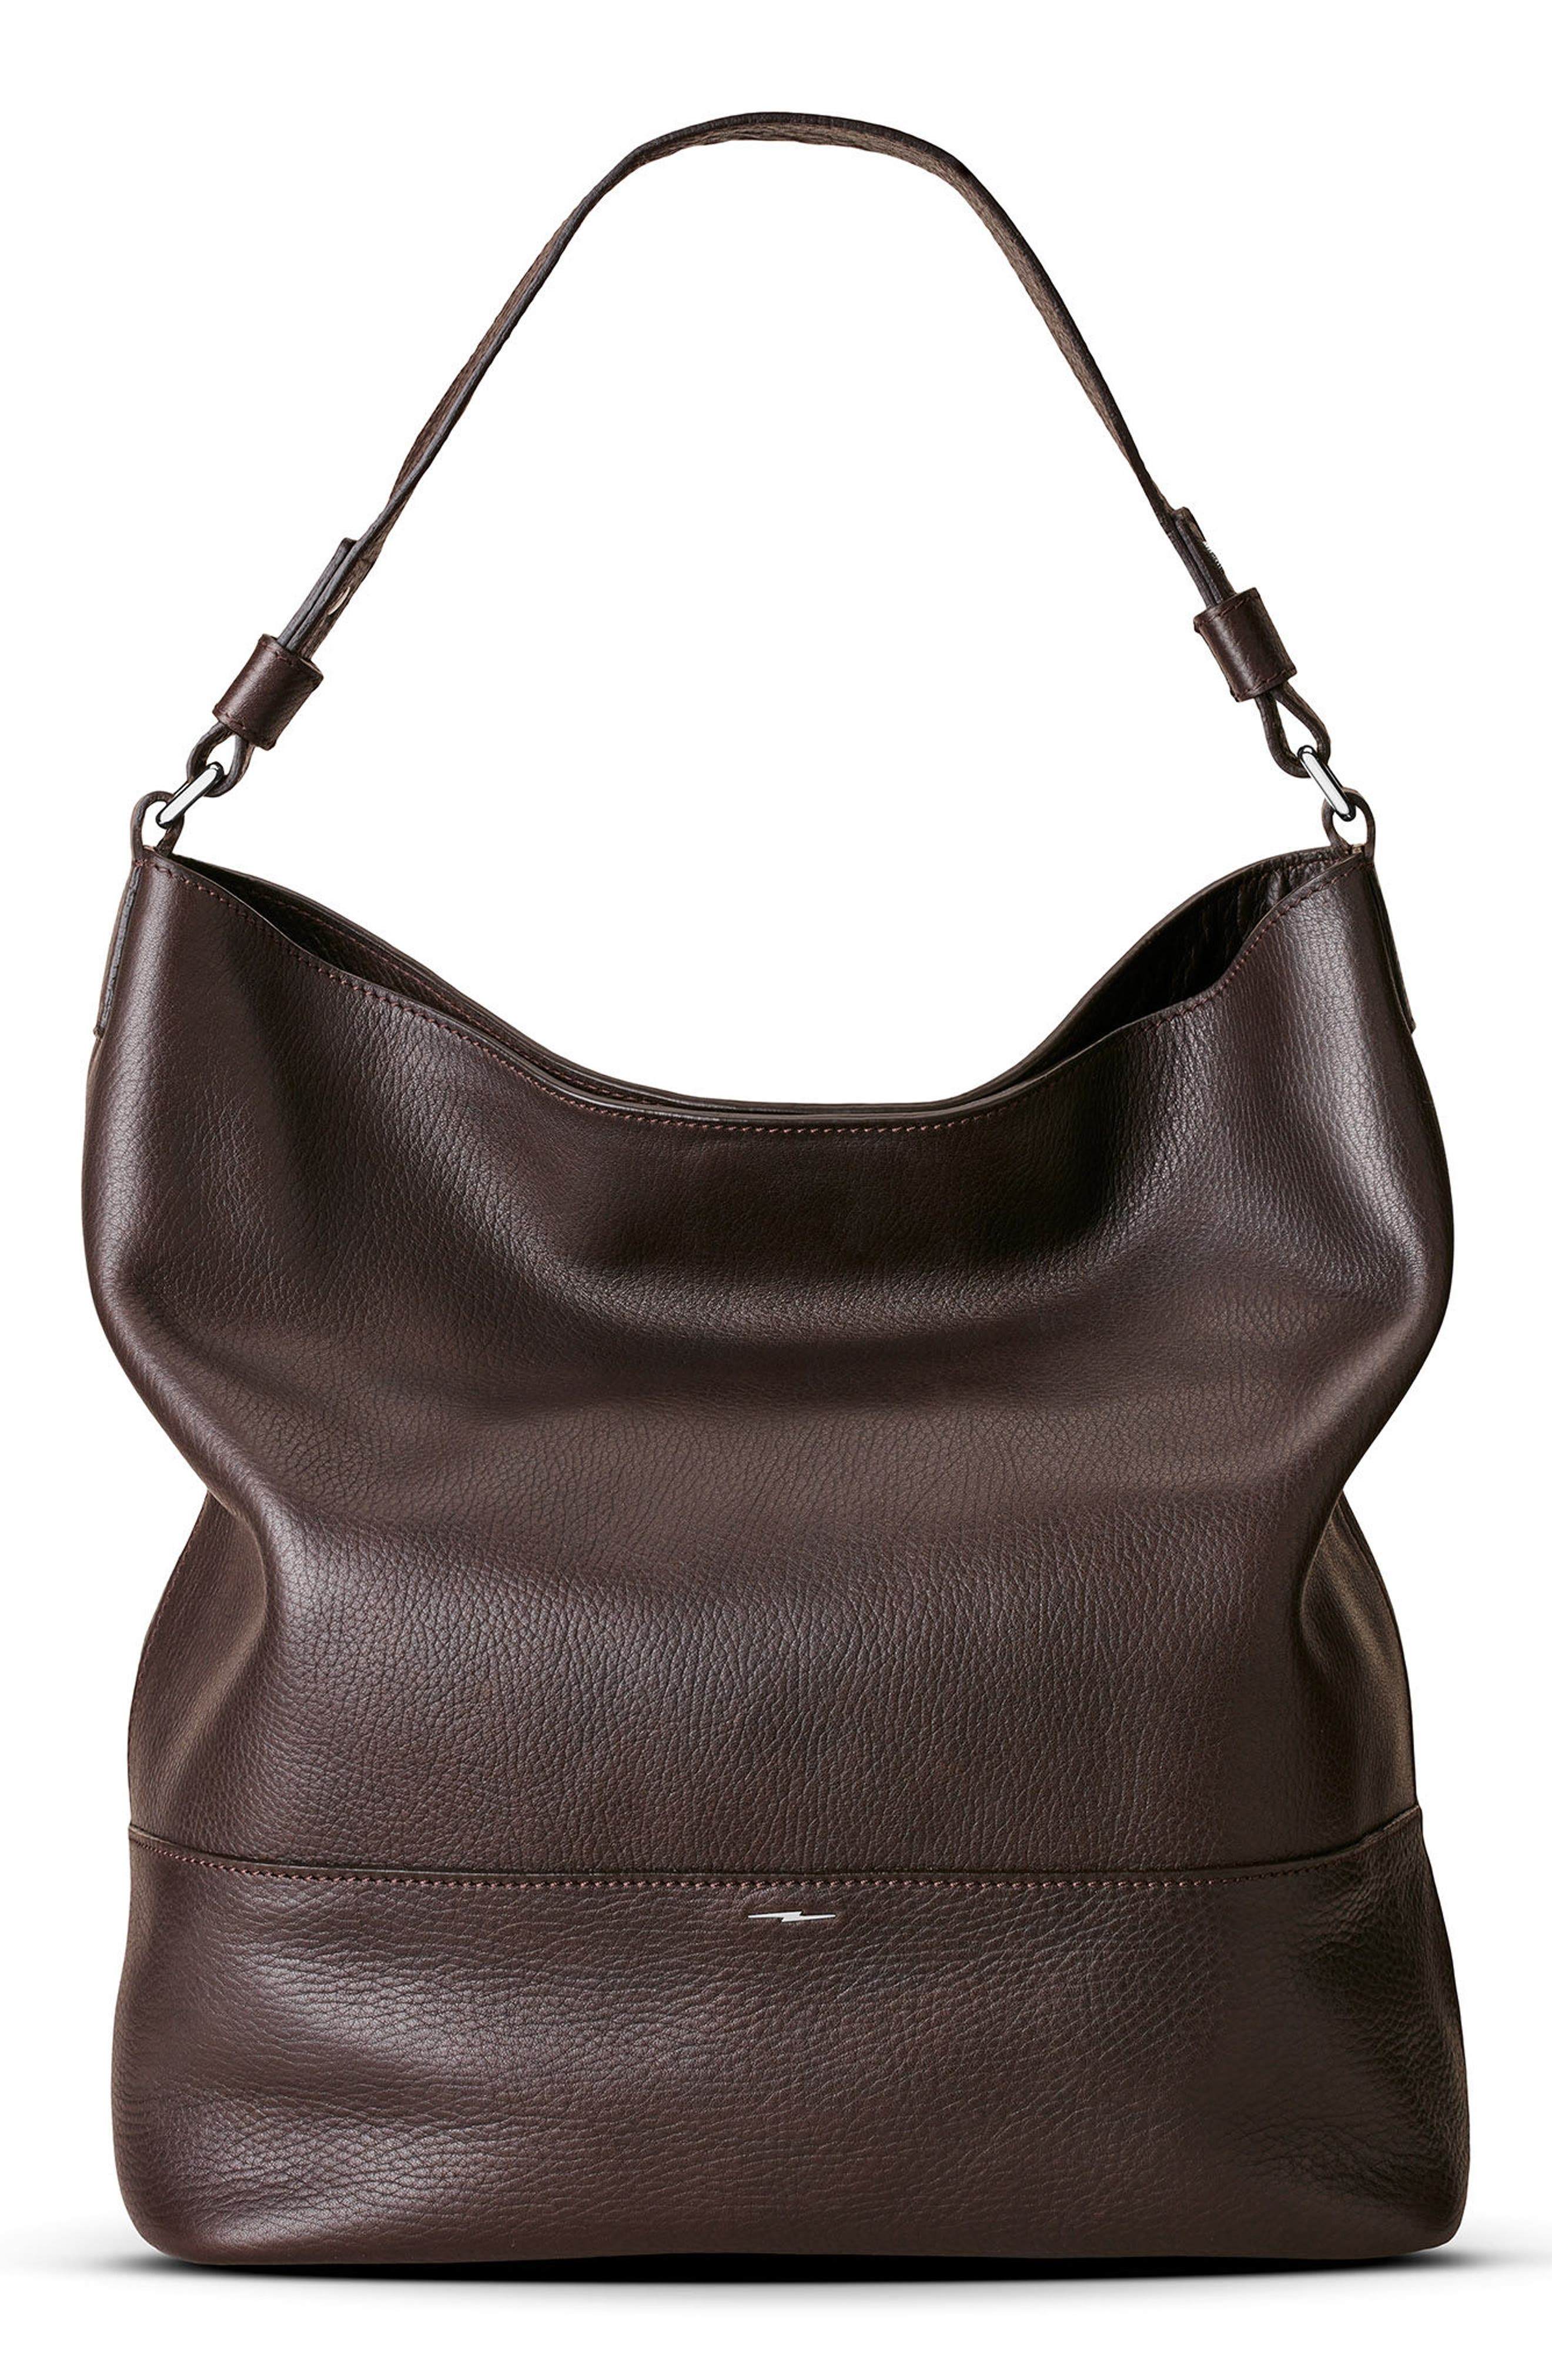 Relaxed Calfskin Leather Hobo Bag,                             Alternate thumbnail 9, color,                             240